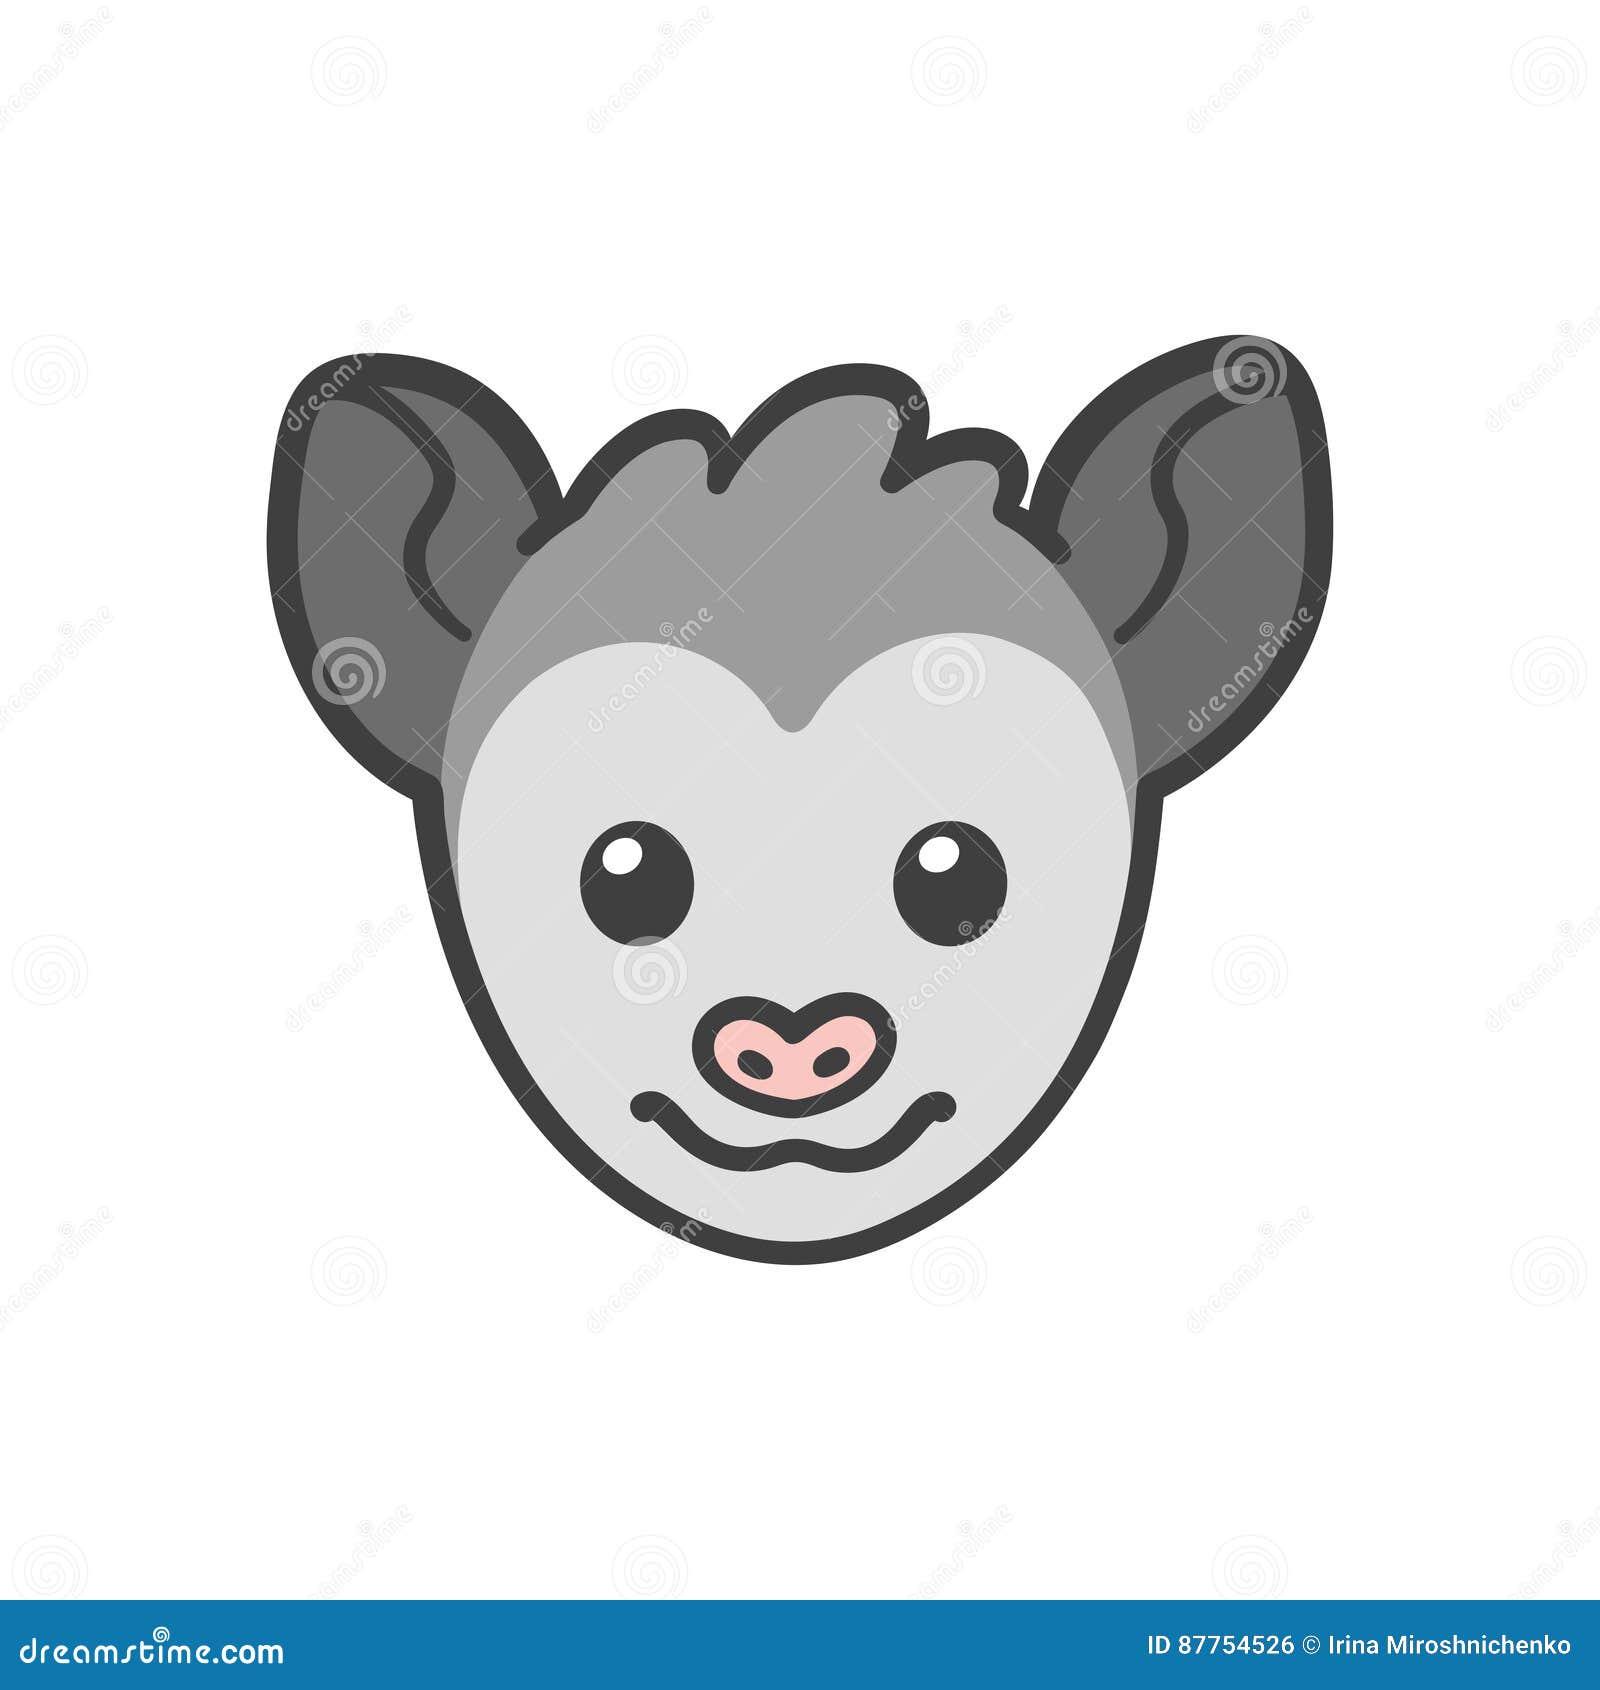 Possum Cartoons, Illustrations & Vector Stock Images - 82 ...